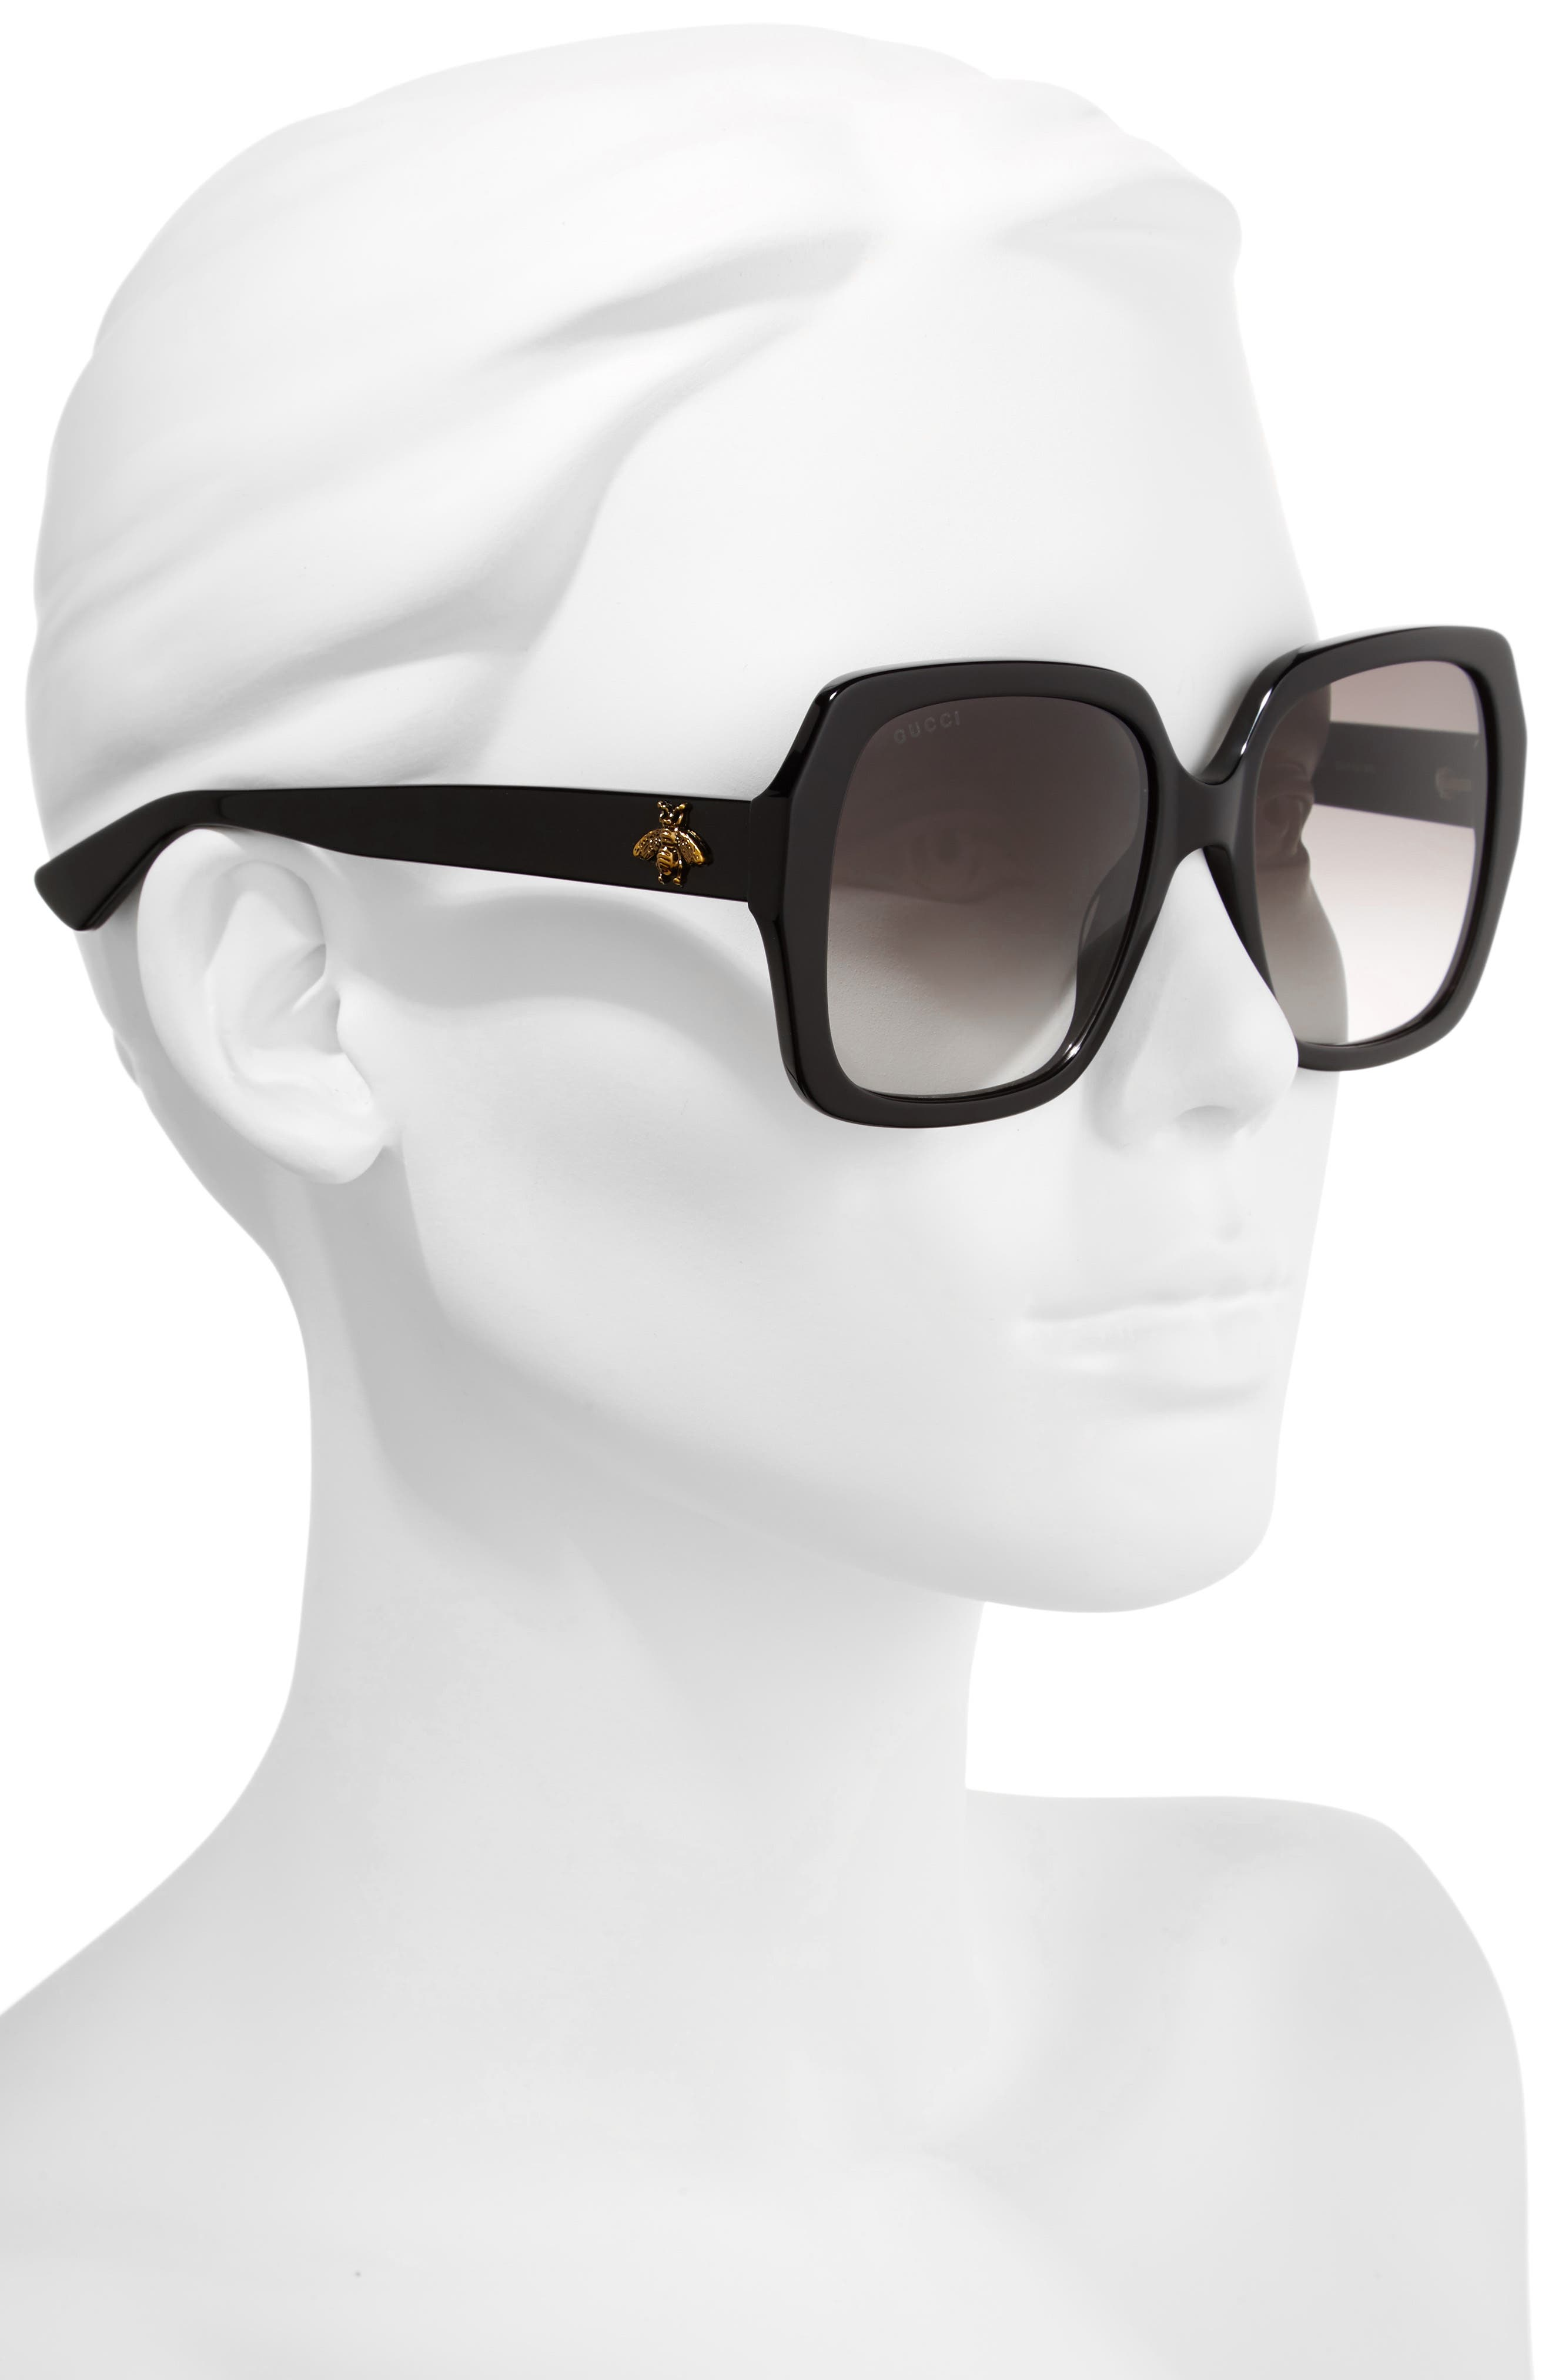 54mm Gradient Square Sunglasses,                             Alternate thumbnail 2, color,                             Black/ Grey